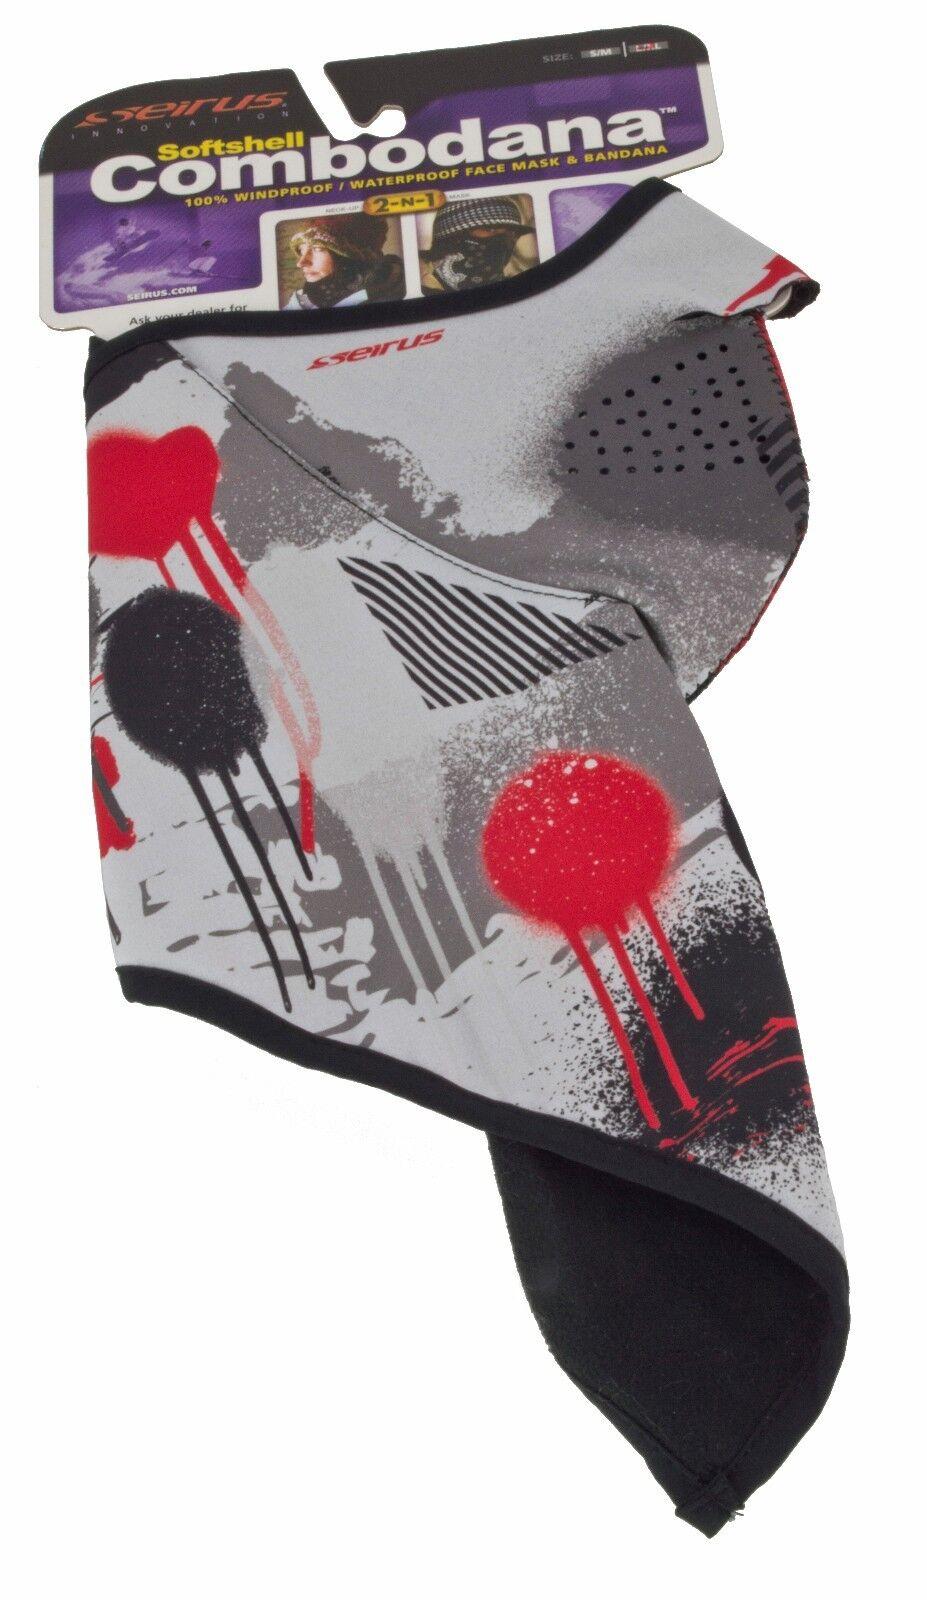 Seirus Softshell Combodana 2-in-1 Waterproof SkiMask//Bandana Vertigo UnisexLG-XL